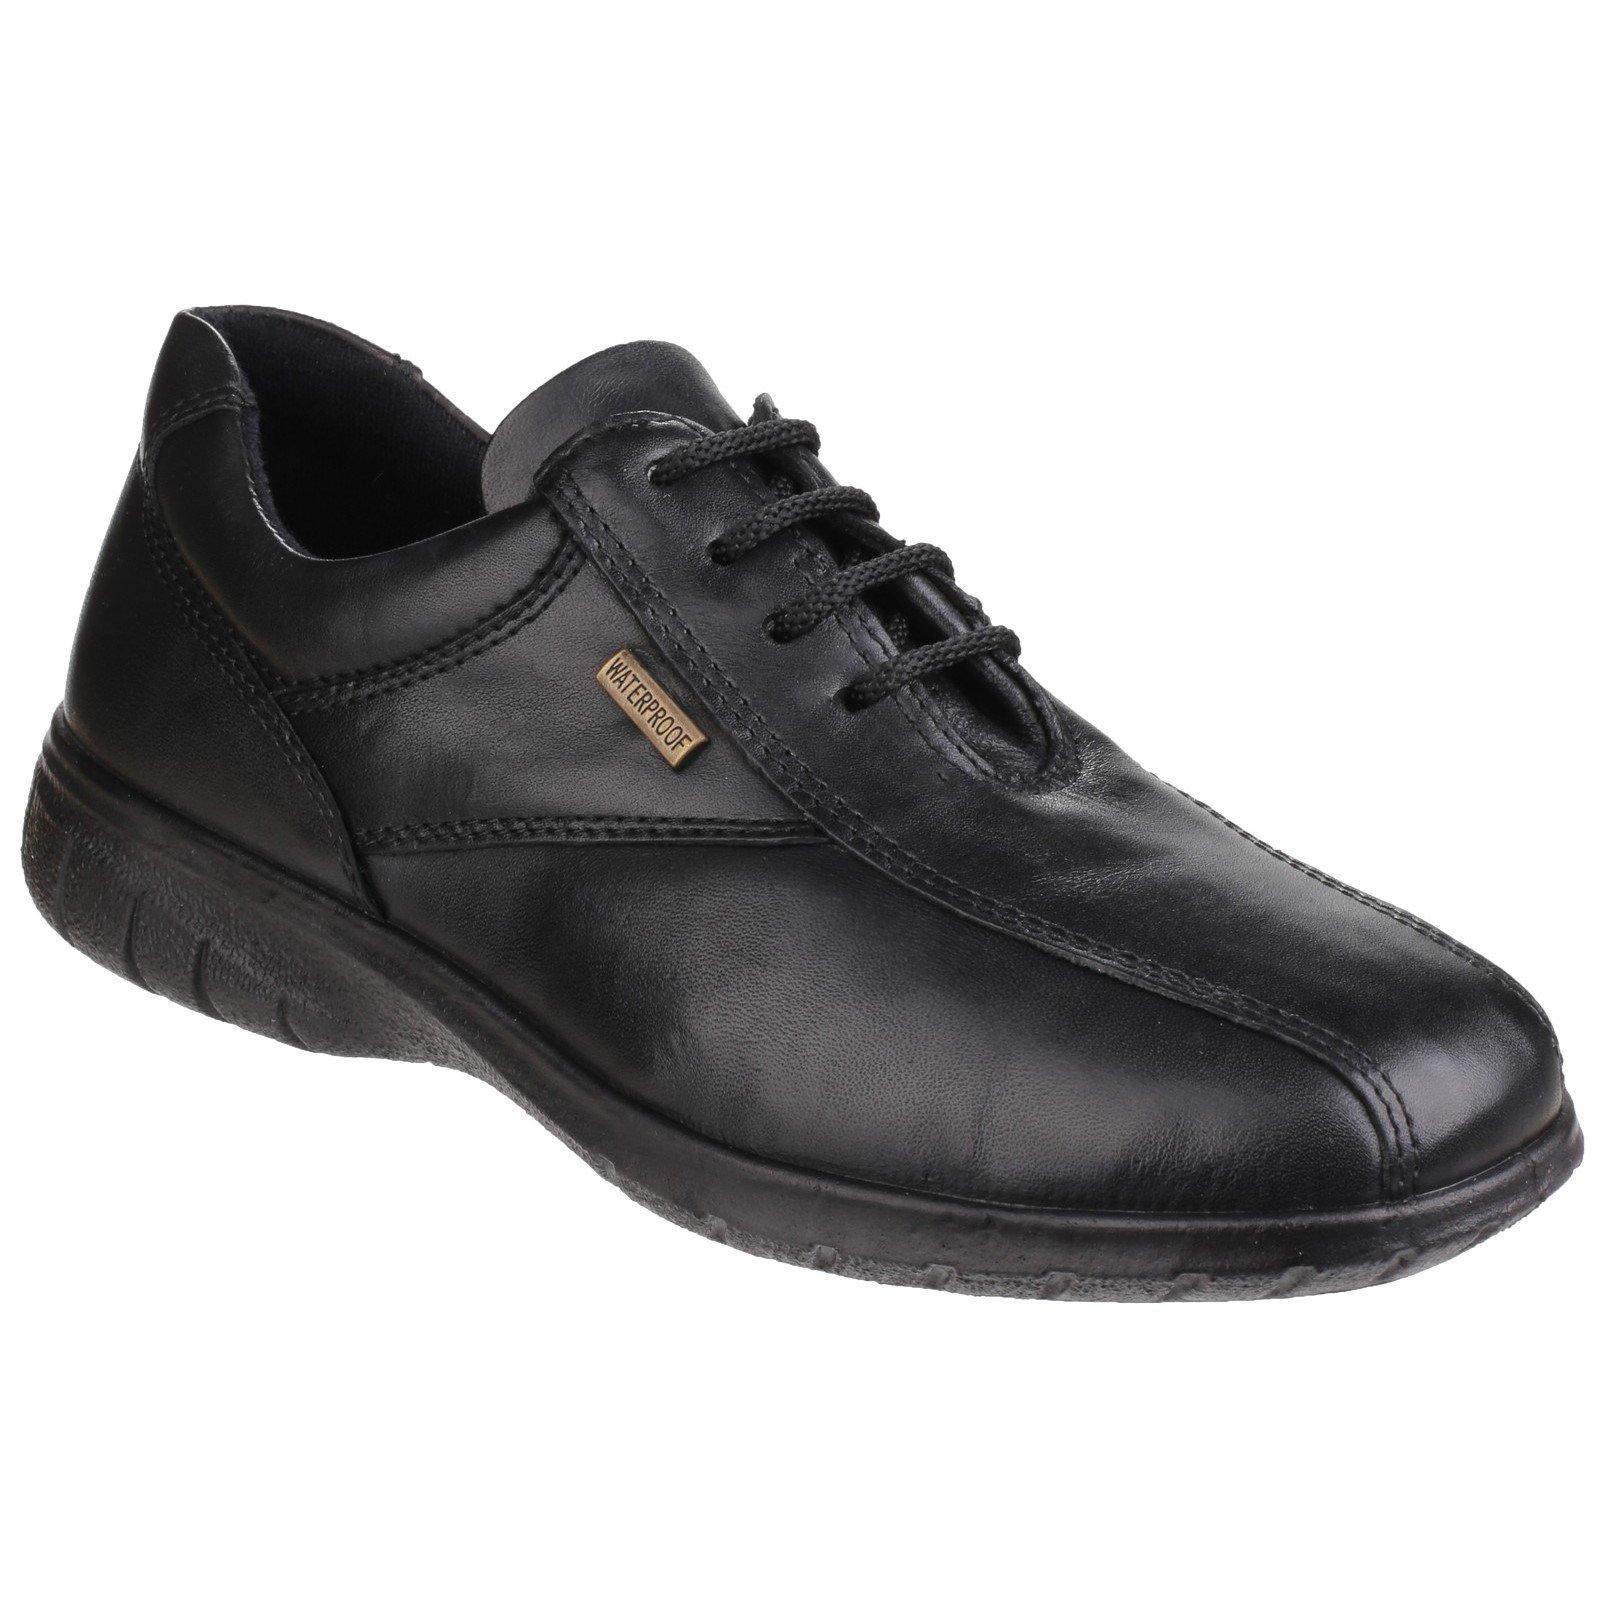 Cotswold Women's Collection Salford Shoe Various Colours 32981 - Black 5